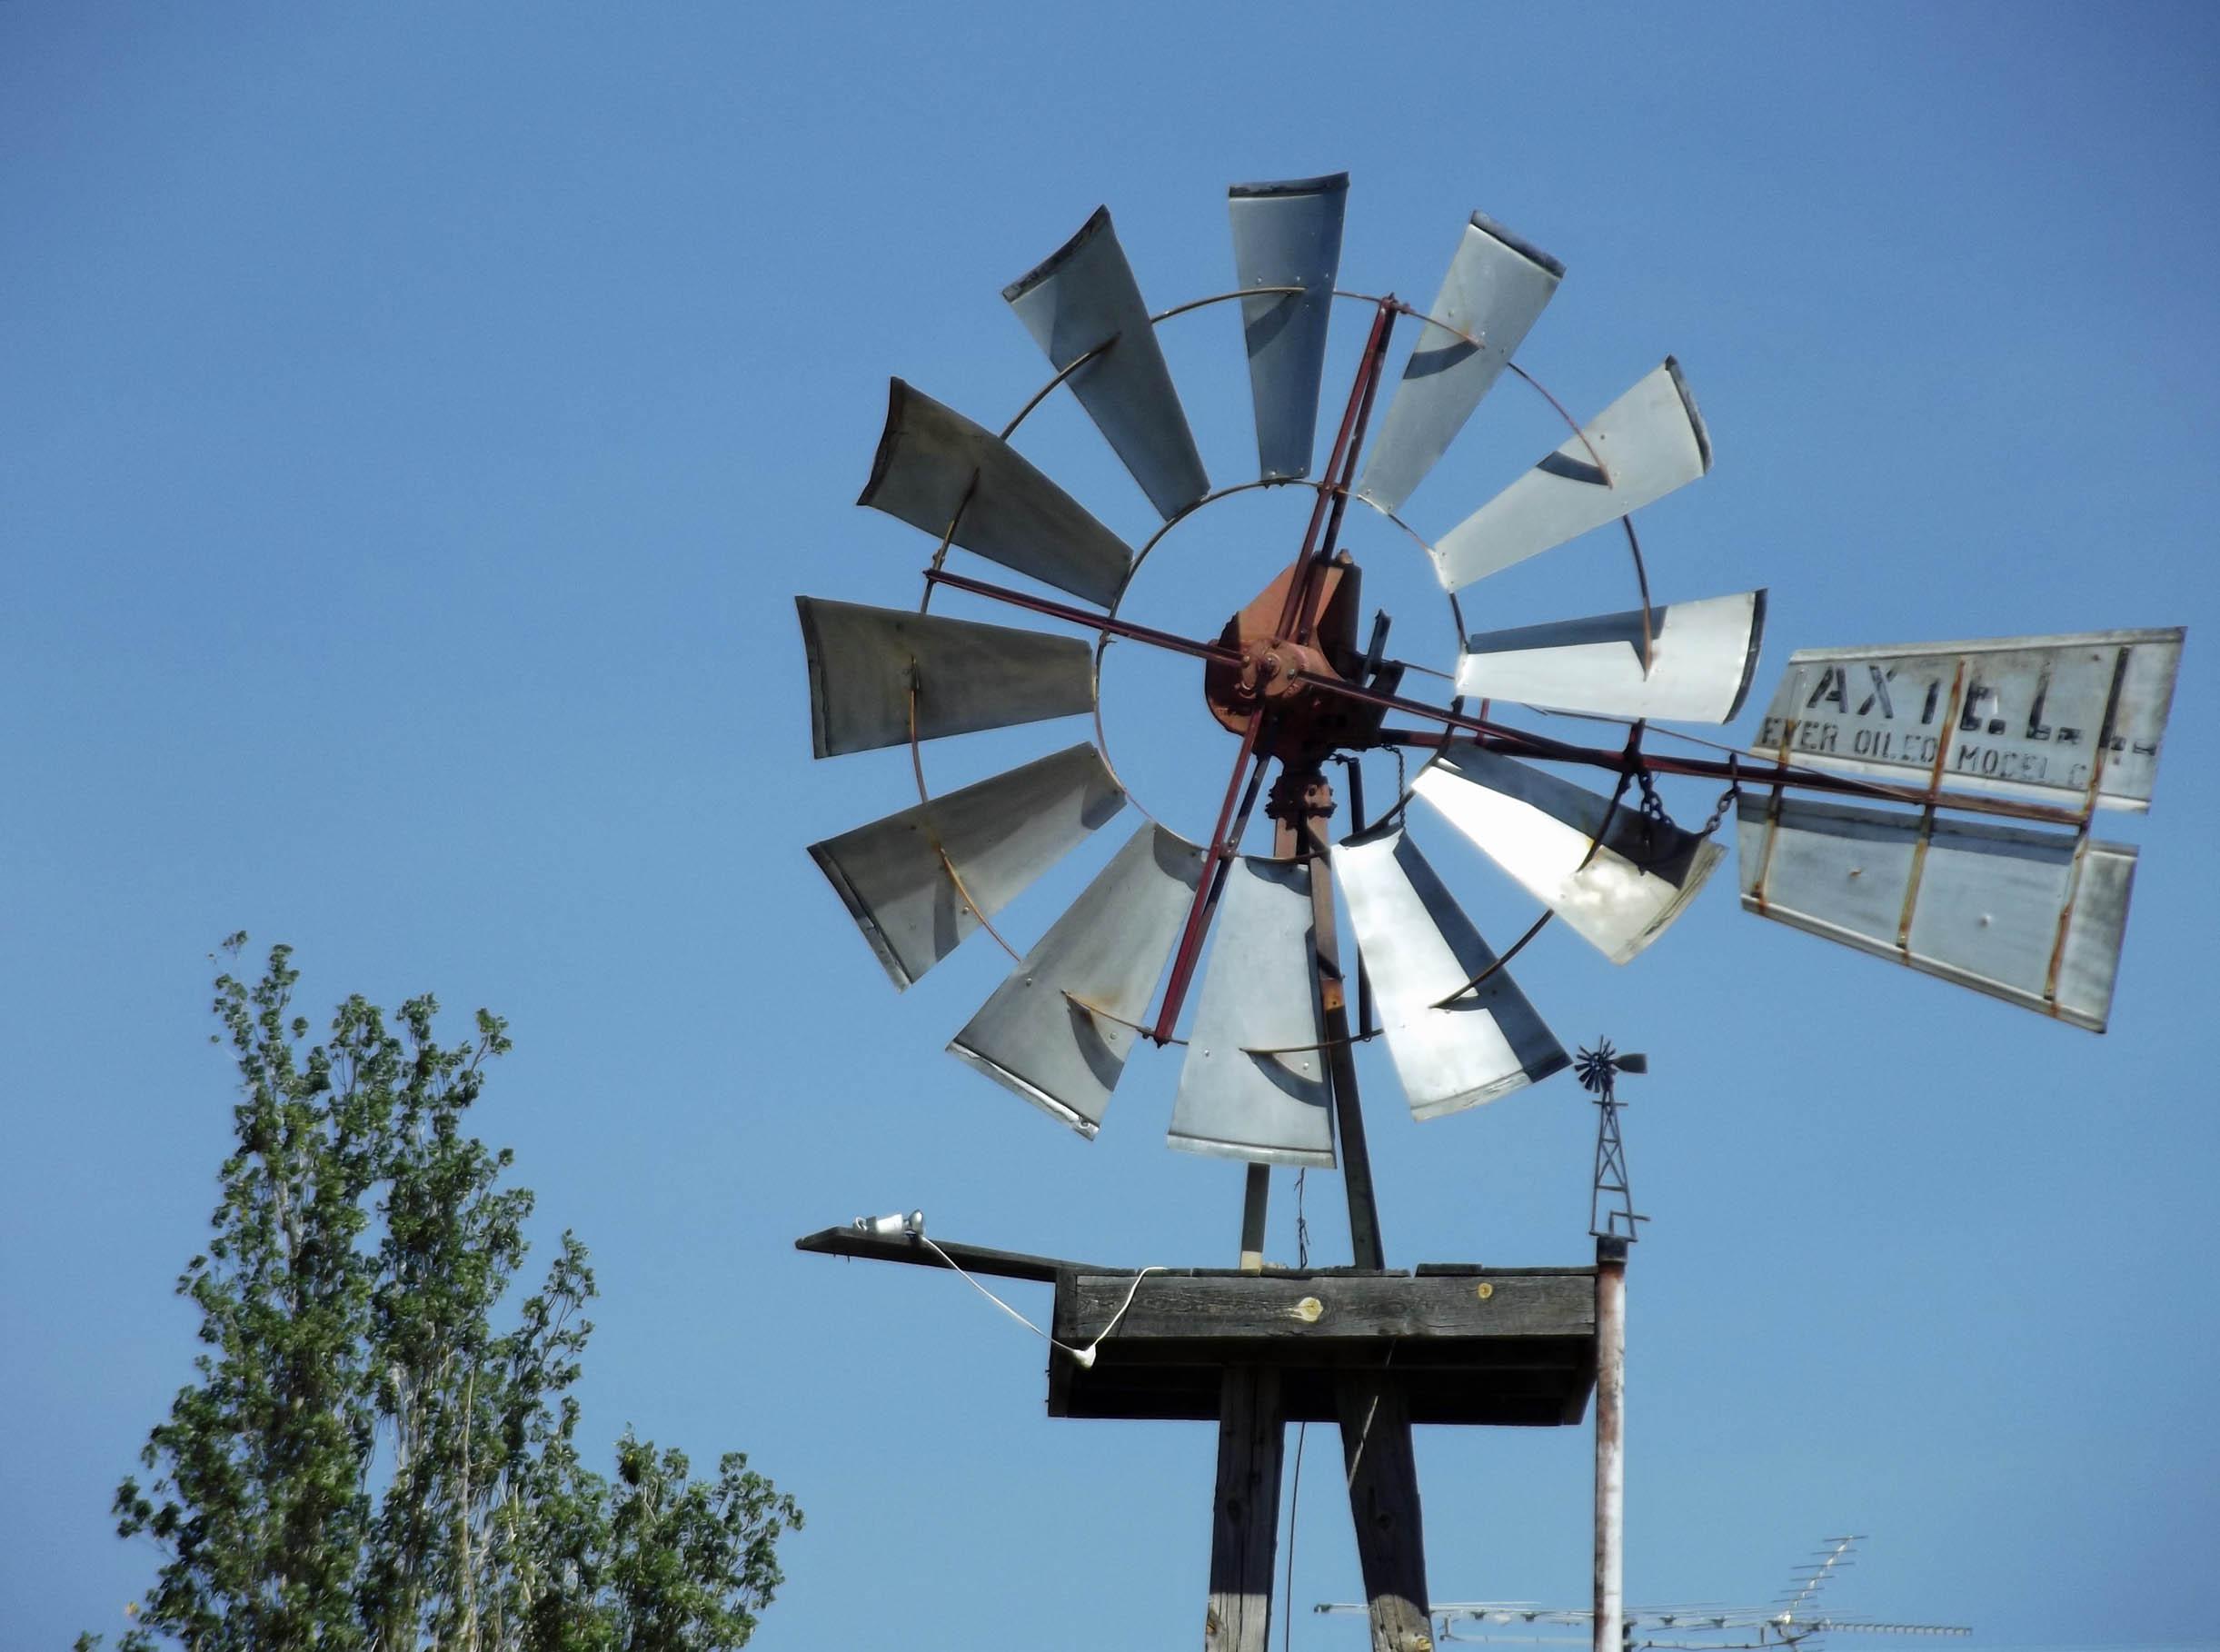 Silver-coloured wind pump